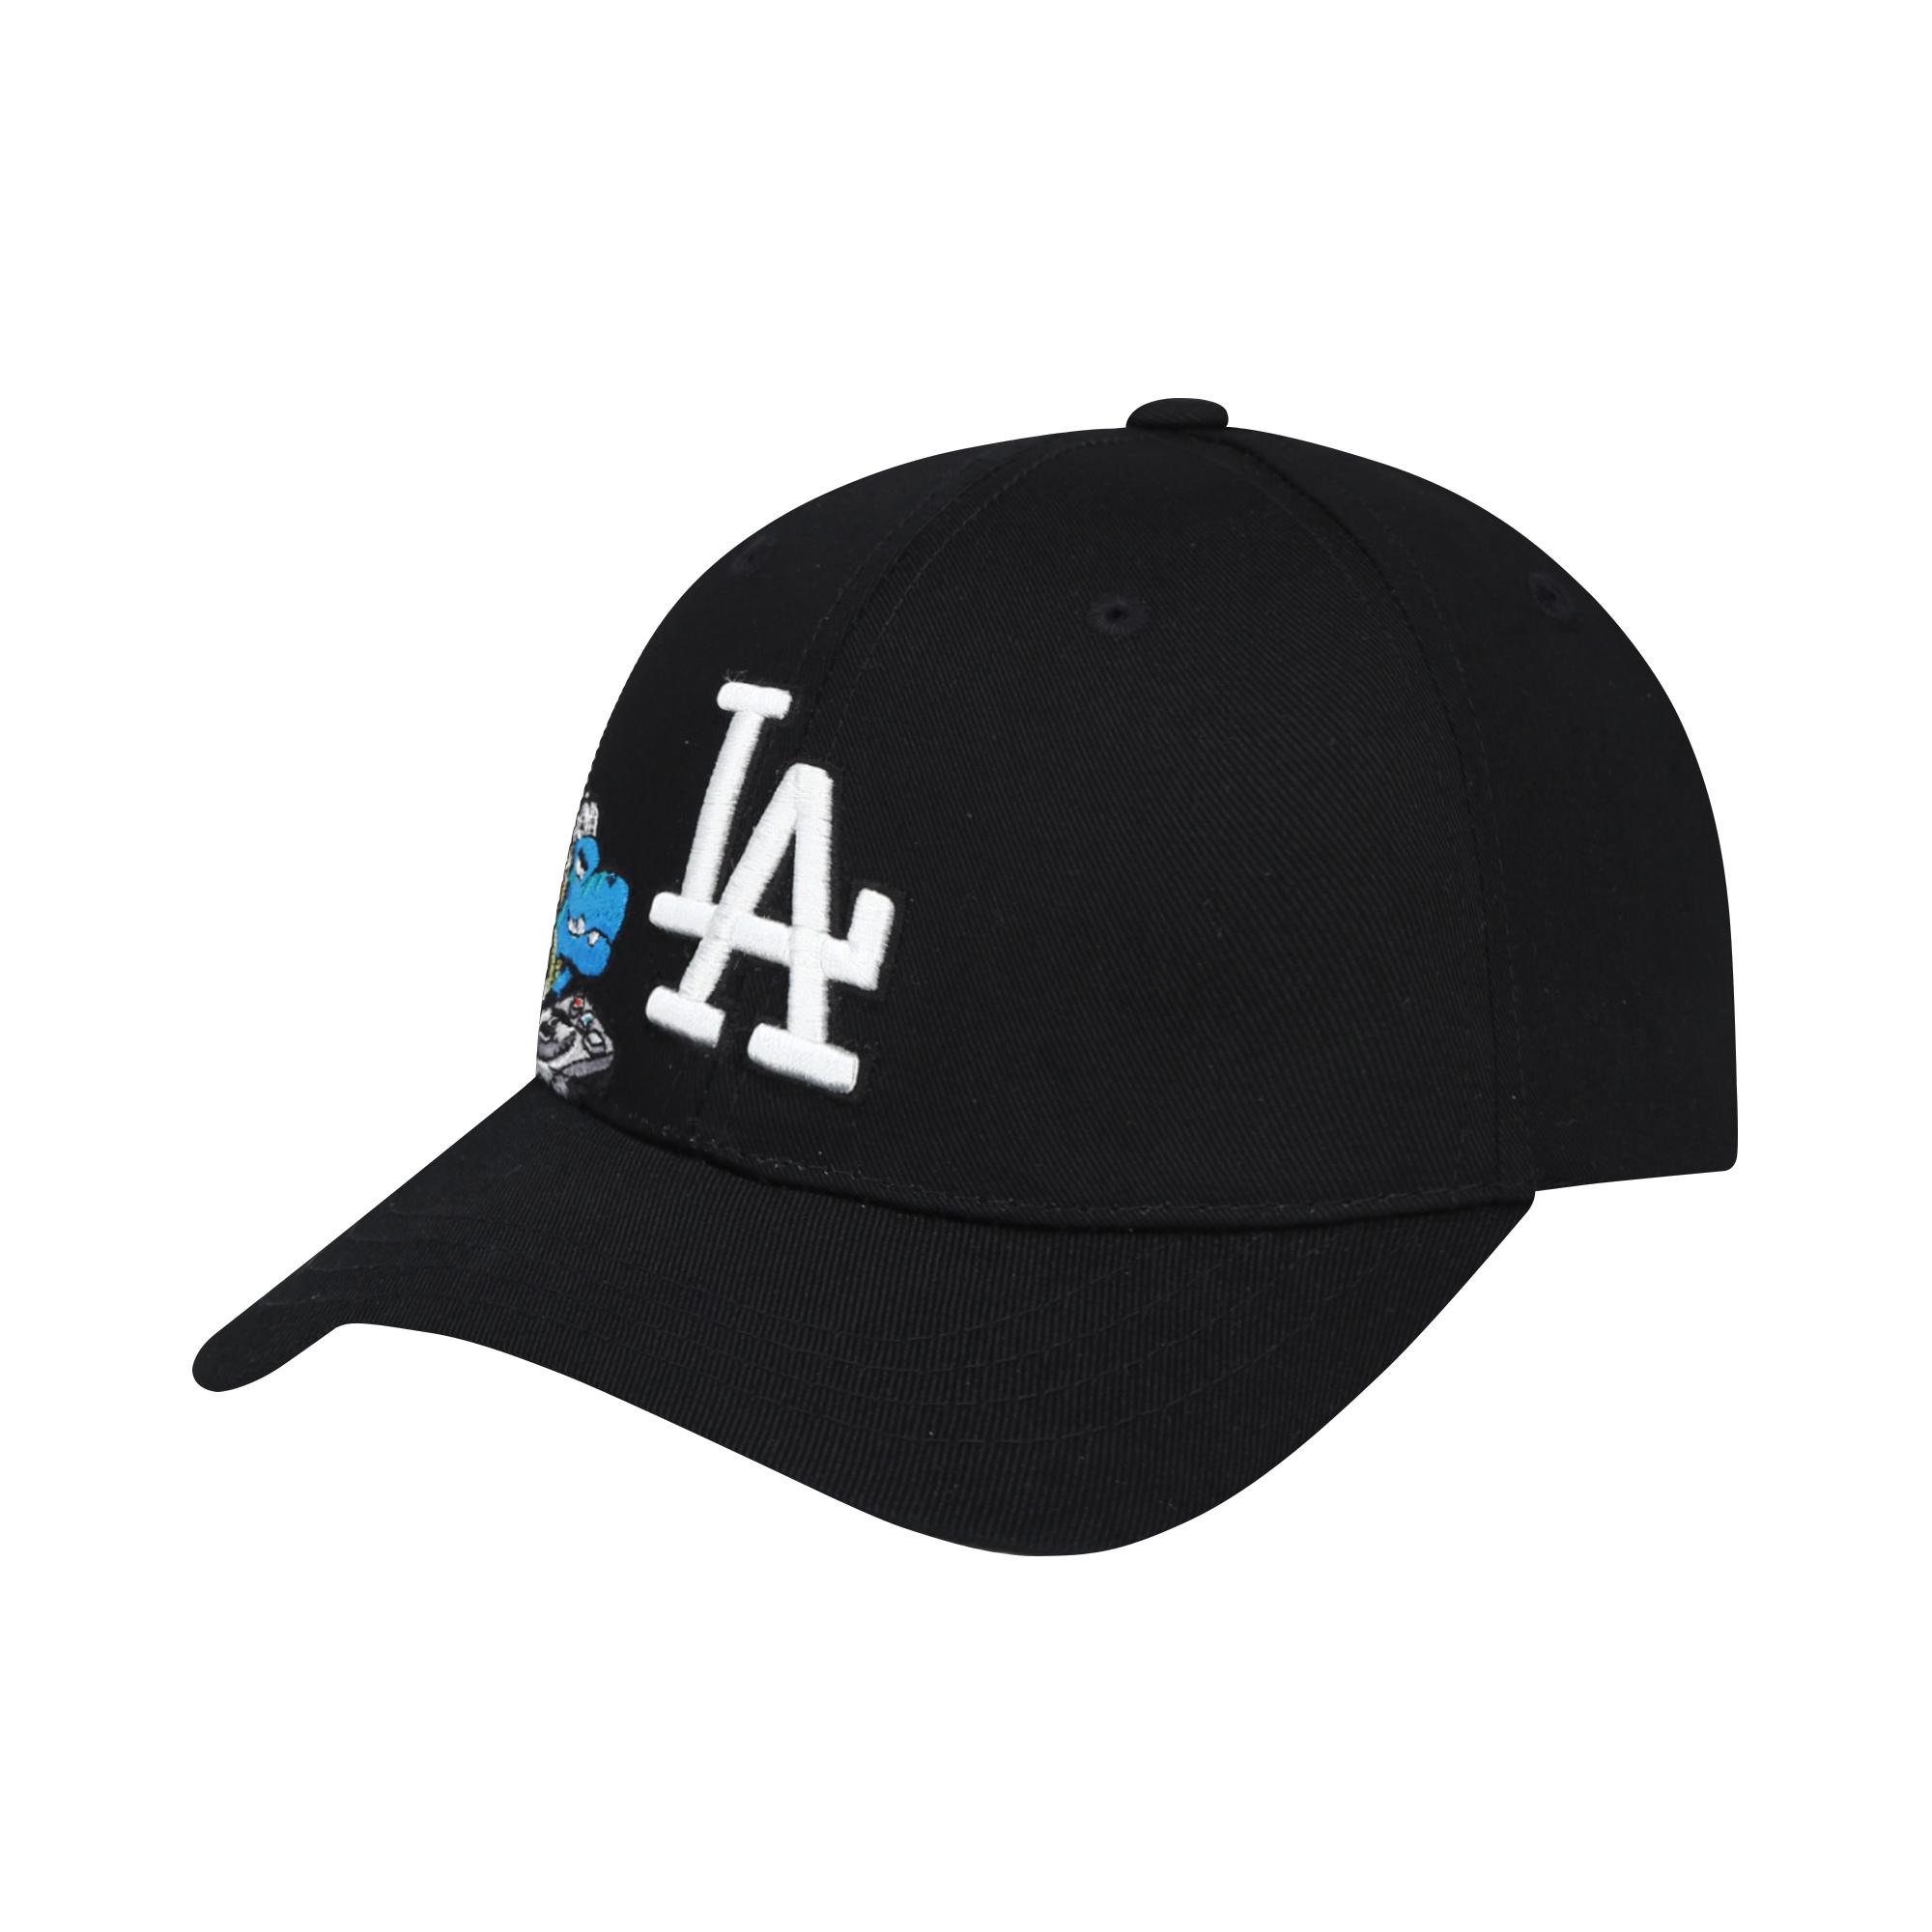 LA DODGERS DJING KINO CURVED CAP